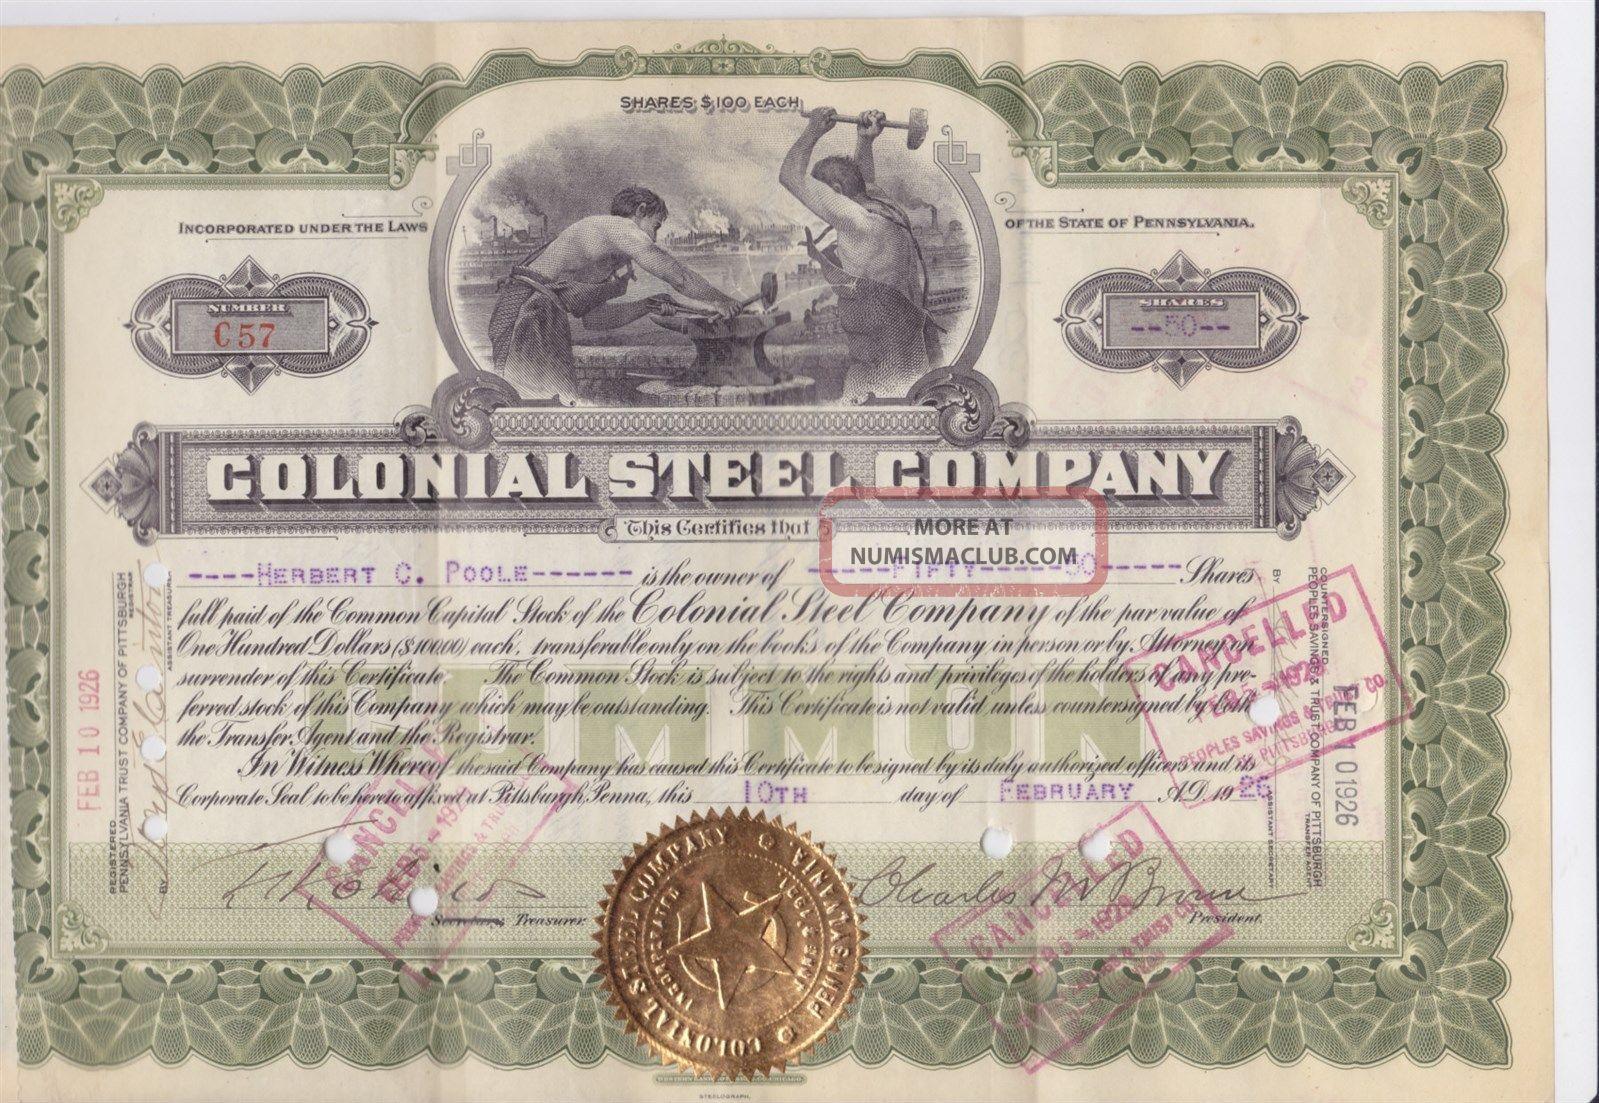 Monaca Pa 1926 Colonial Steel Co.  Stock Certificate Stocks & Bonds, Scripophily photo